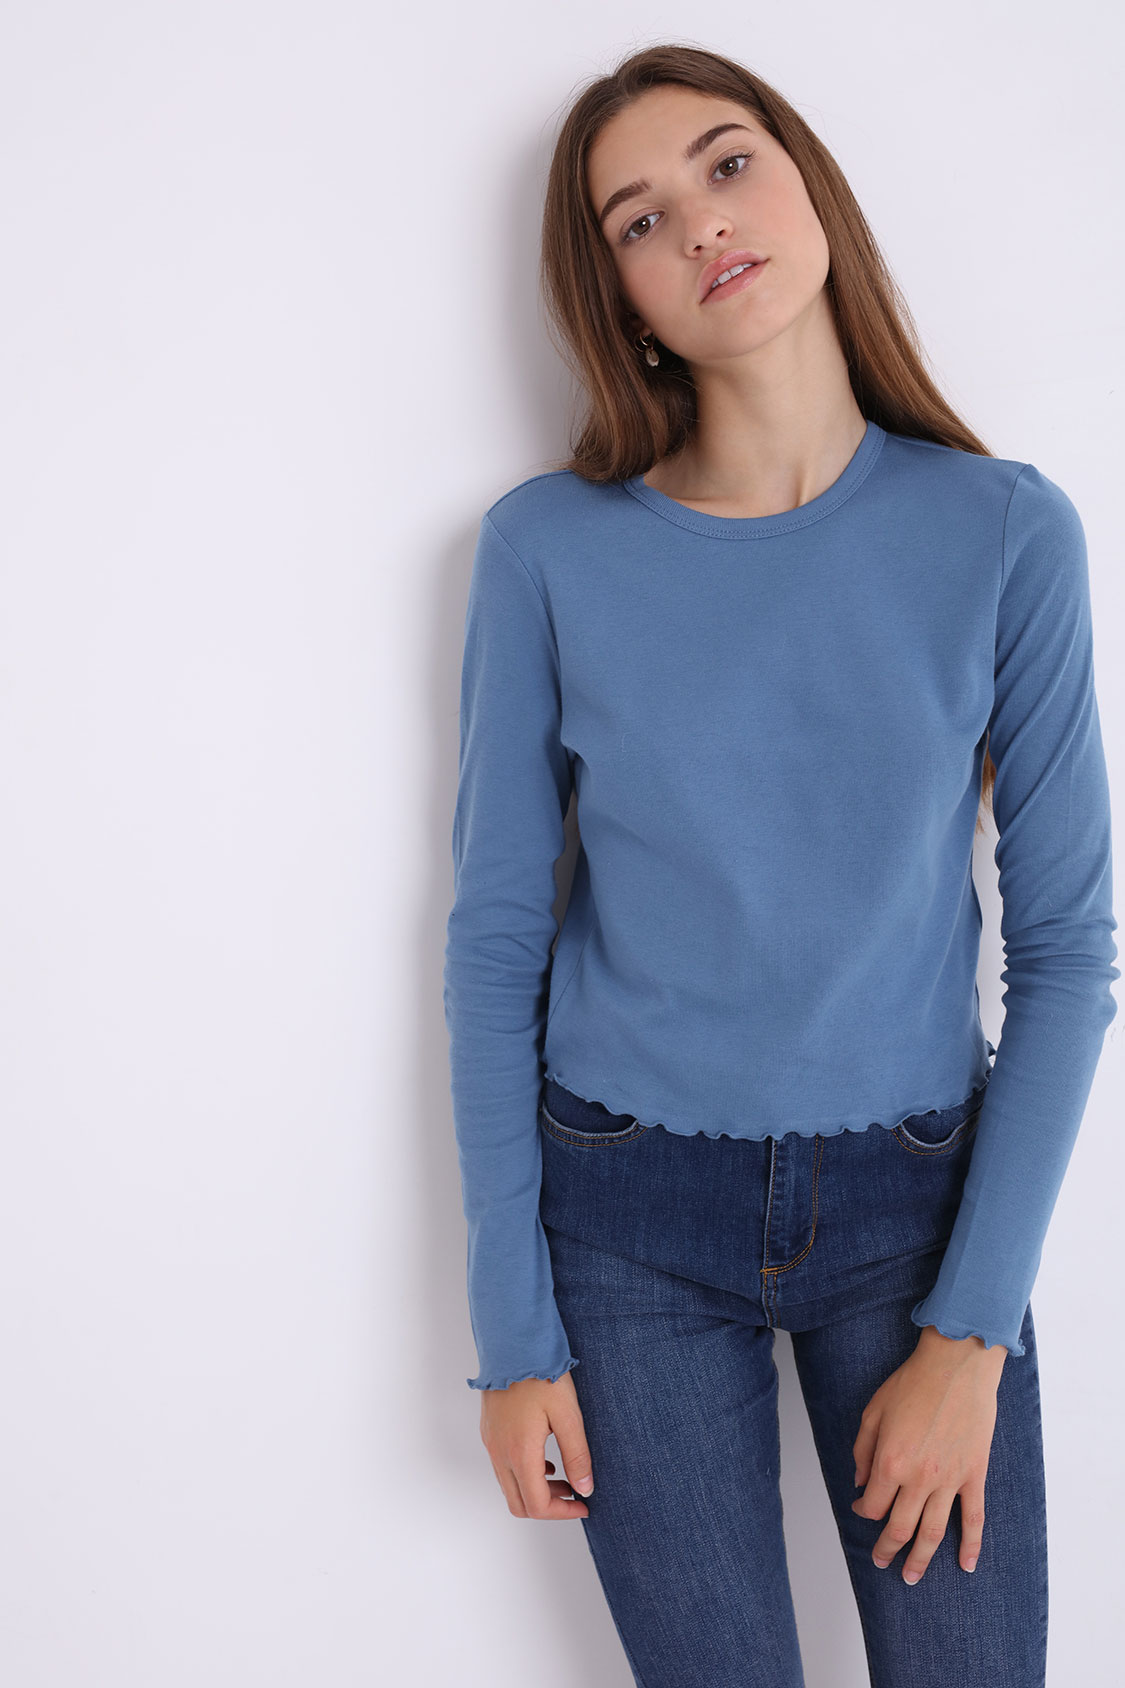 Camiseta bajo rizado